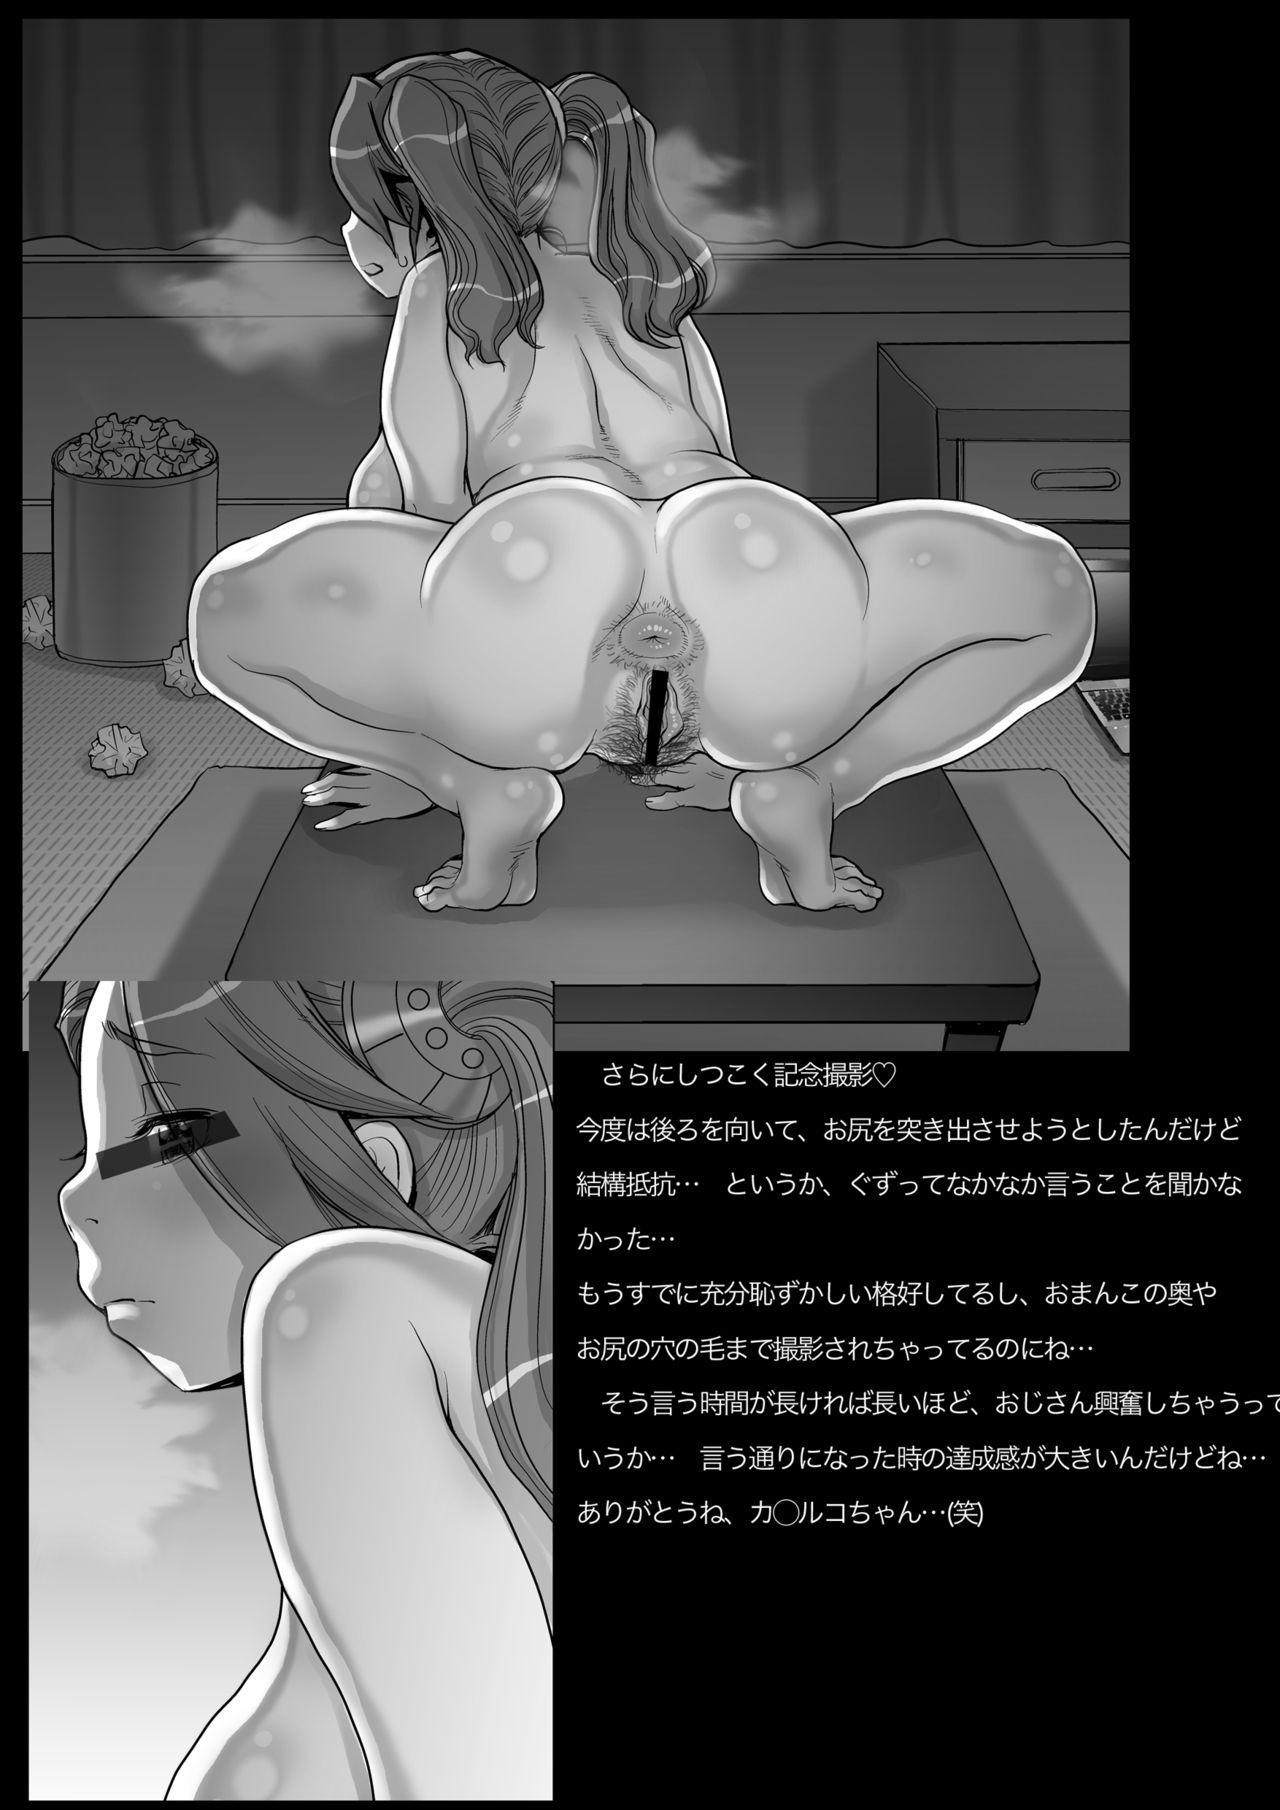 [Studio Tapa Tapa (Sengoku-kun)] Daddy-Long-Legs #3 (Gundam Build Fighters Try) [Digital] 83